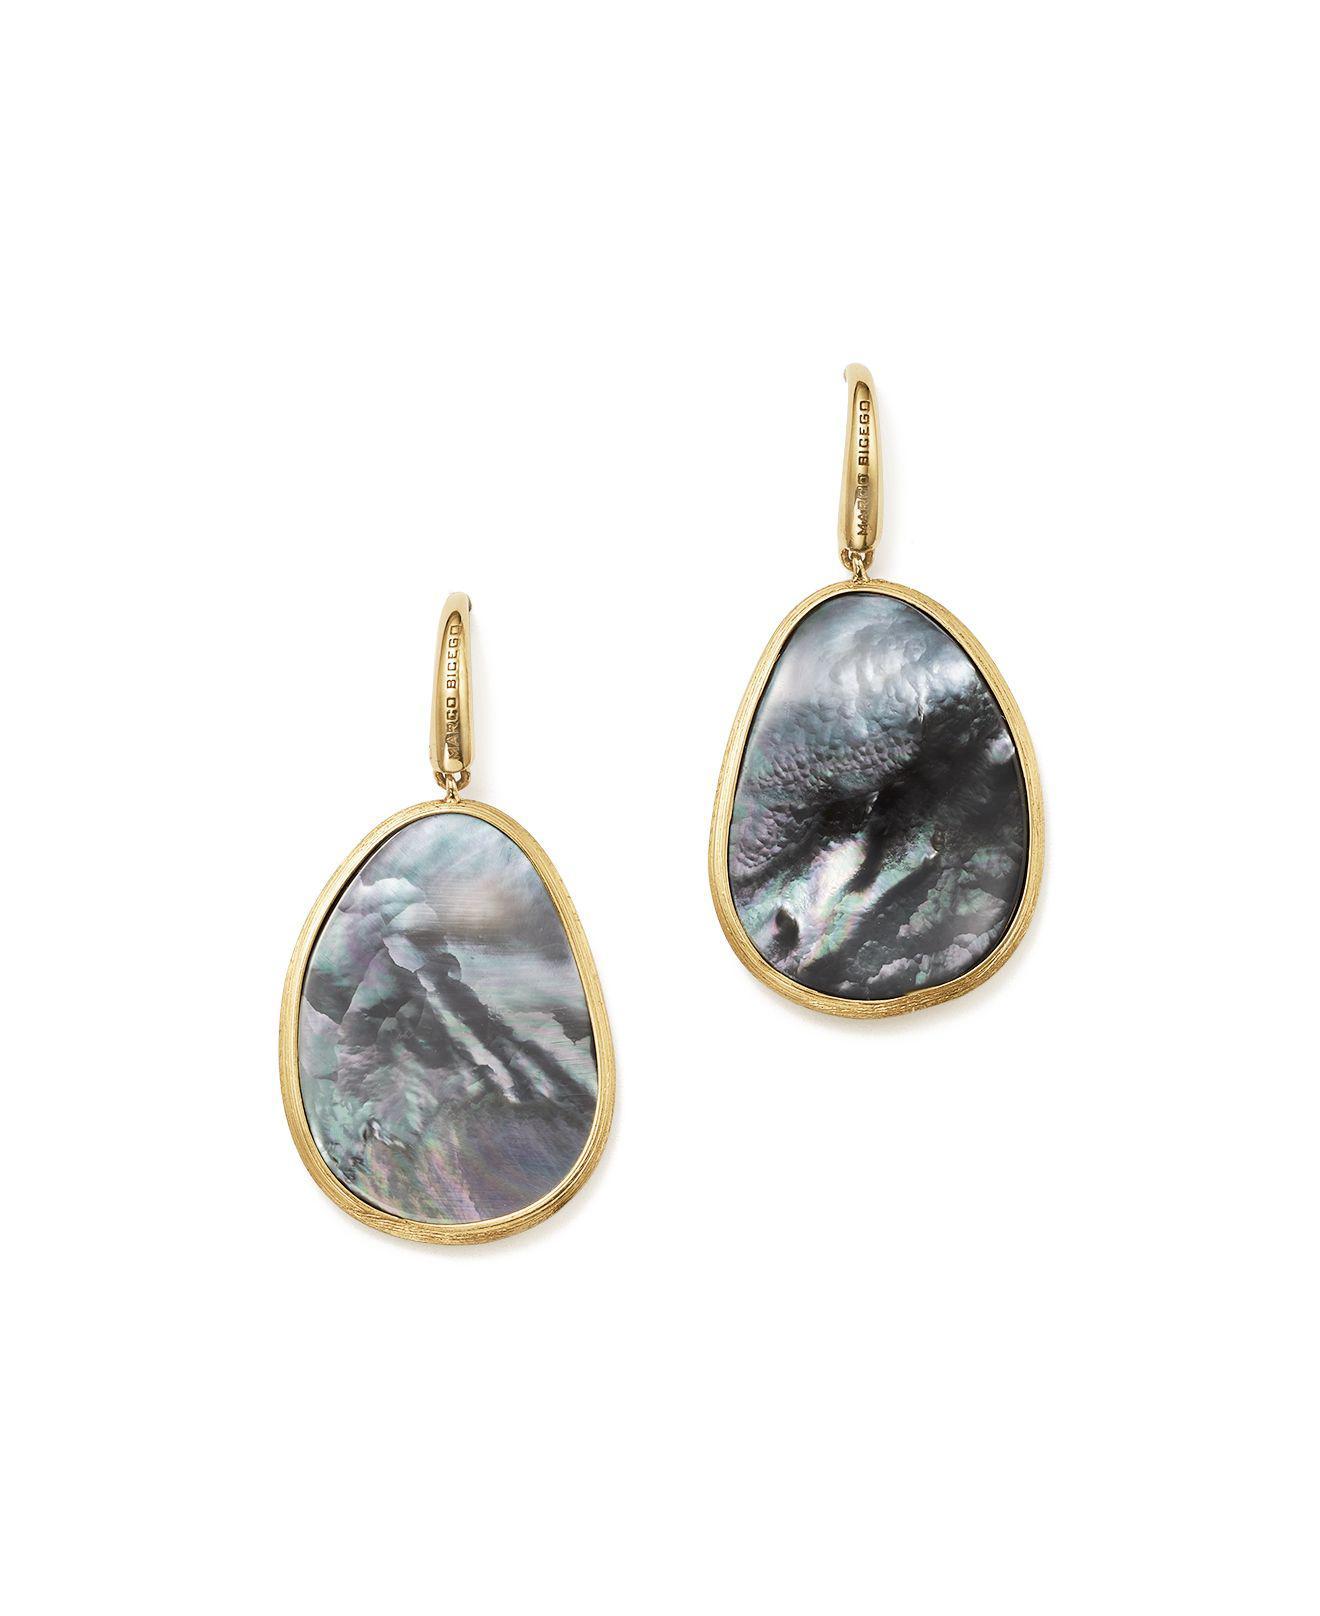 Marco Bicego 18K Lunaria Triple-Drop Earrings with Black Mother-of-Pearl & Diamond kheInxUL